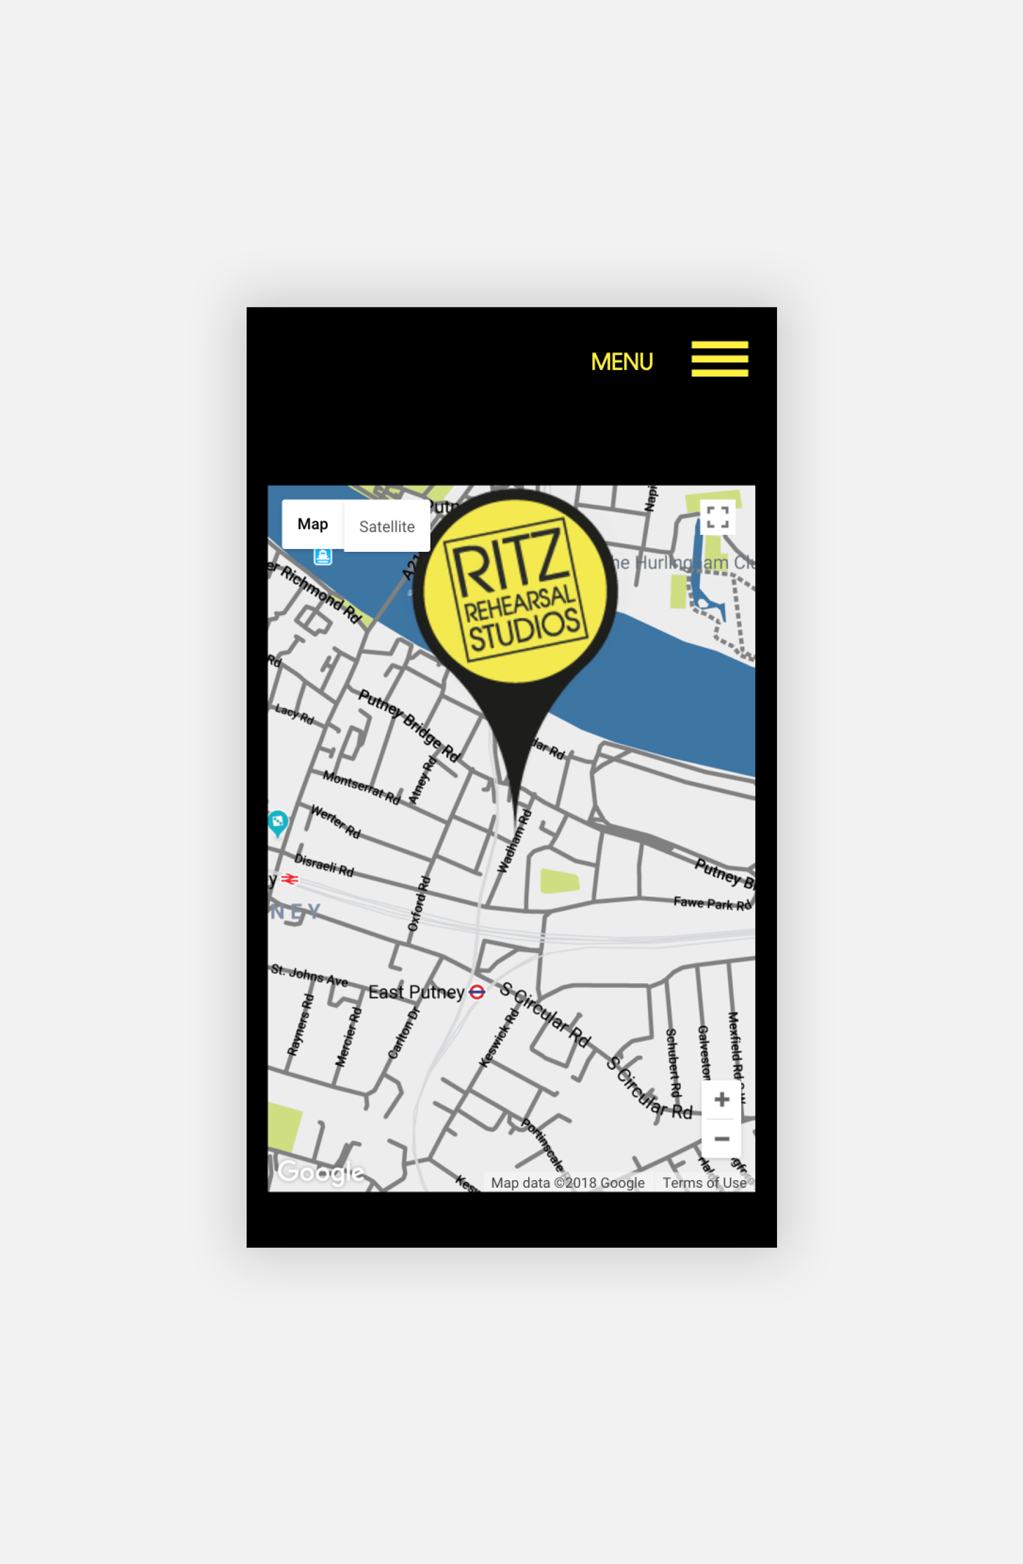 Ritz Rehearsal Studios Map